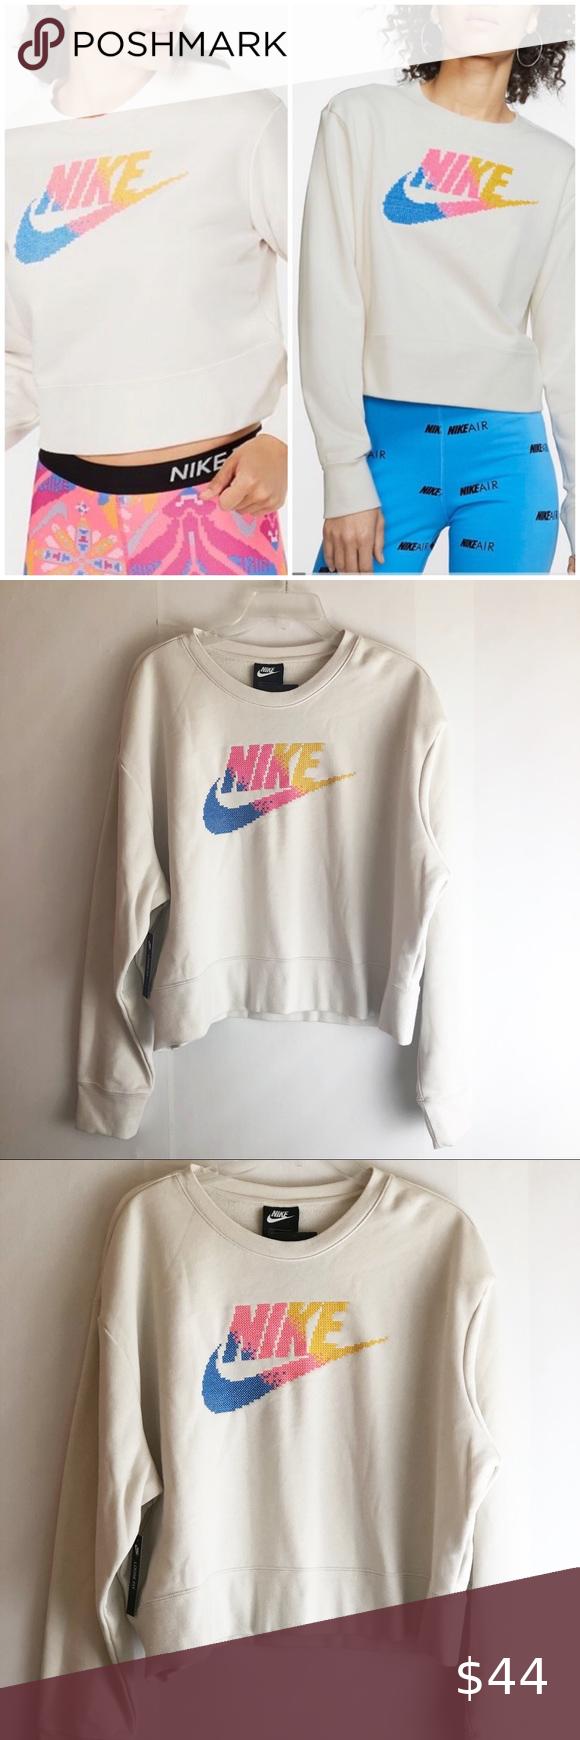 New Nike Stitch Logo Cropped Oversized Sweatshirt Sweatshirts Oversized Sweatshirt Sweatshirts Hoodie [ 1740 x 580 Pixel ]